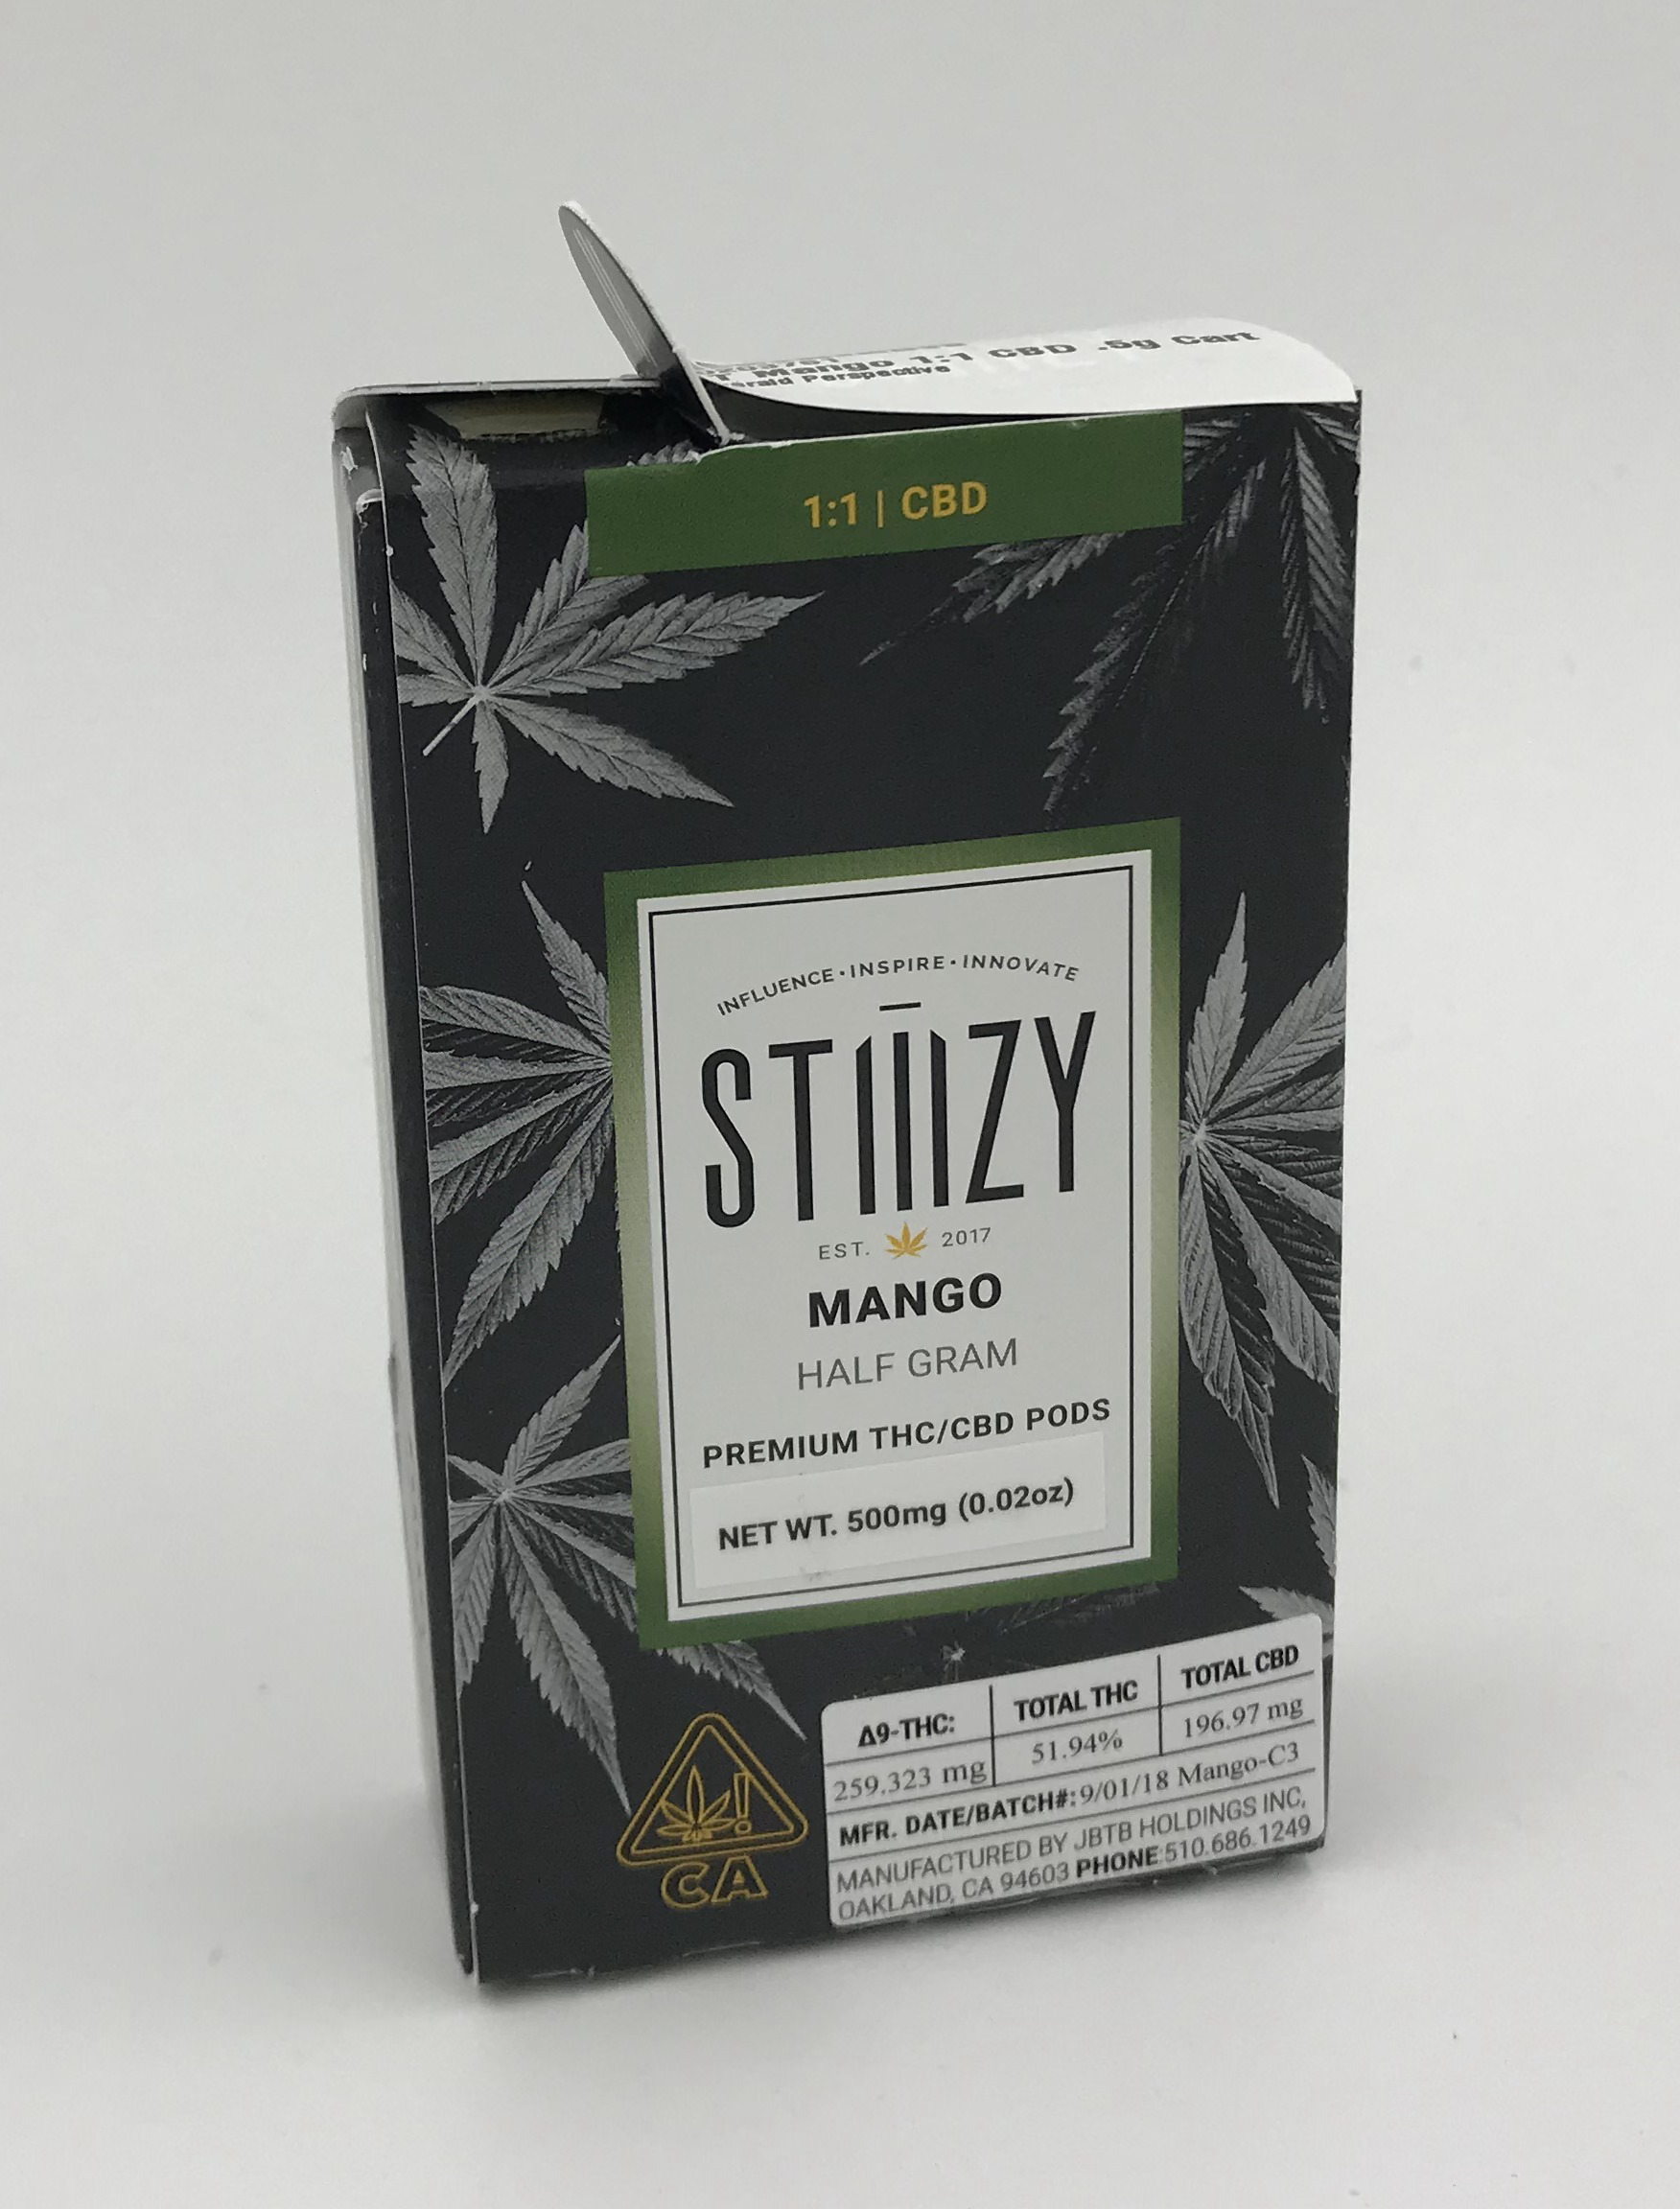 Mango 1:1 CBD POD by Stiiizy – Emerald Perspective